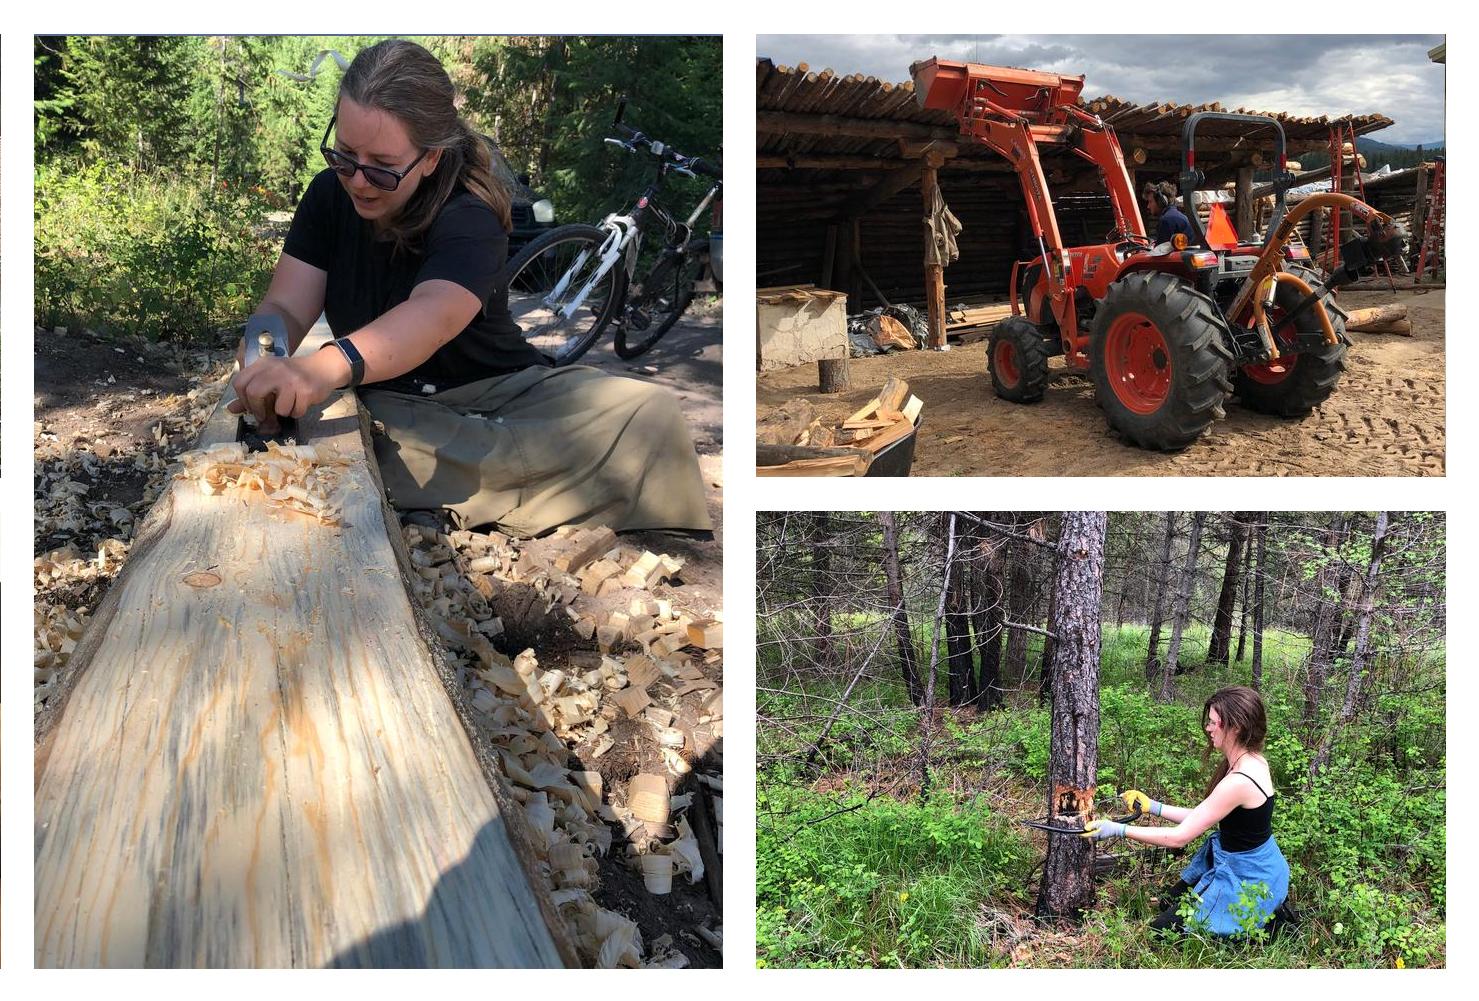 planing wood, handsaw, front-end loader tractor natural building